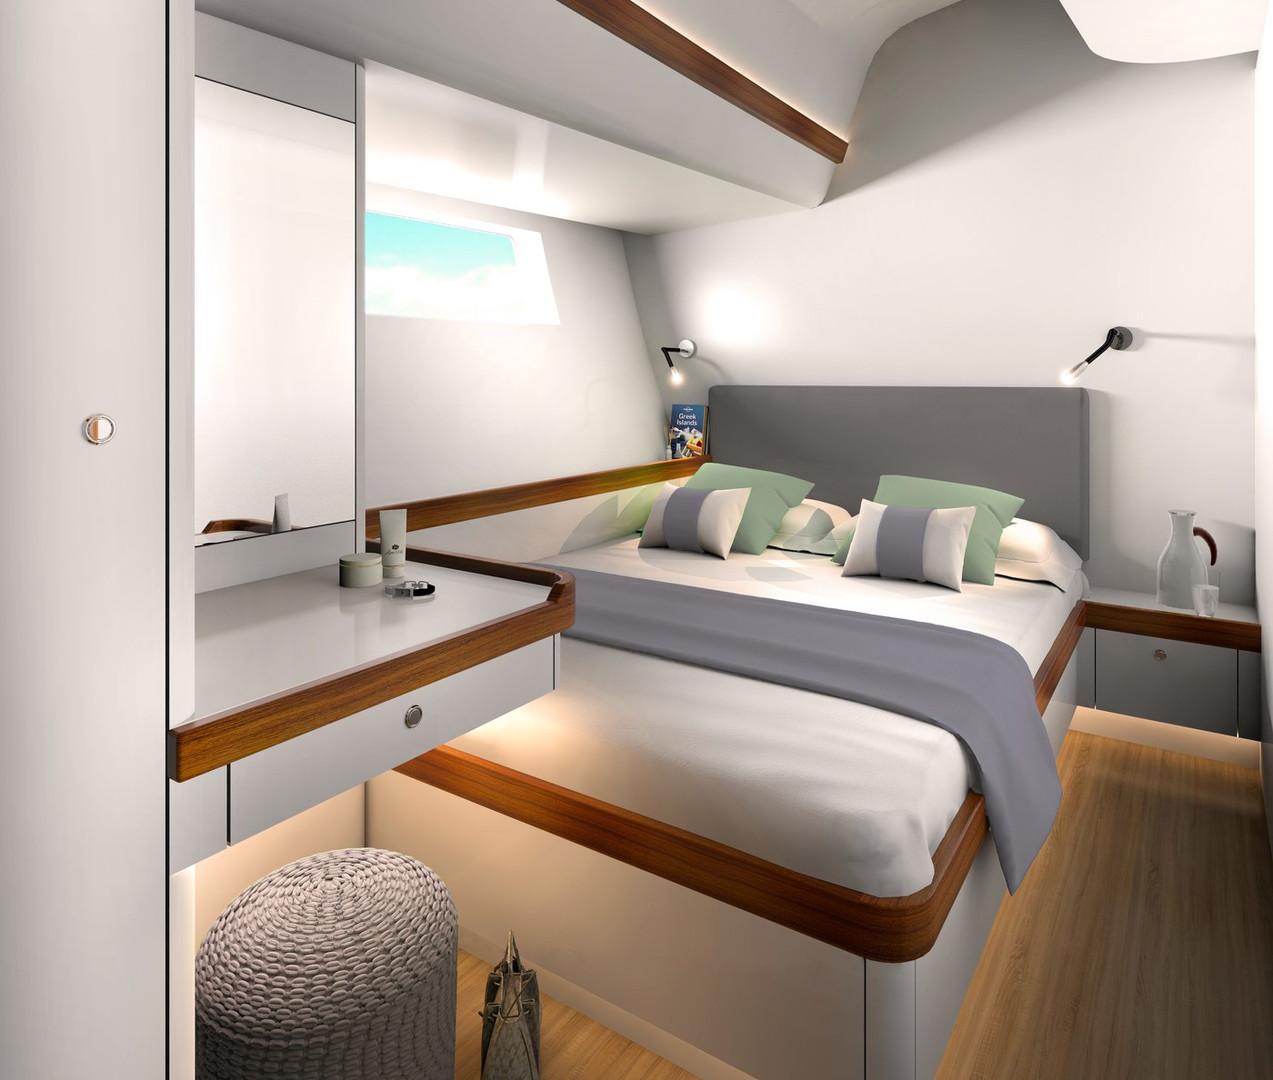 sj115-cabin-visual-1400x1400.jpg